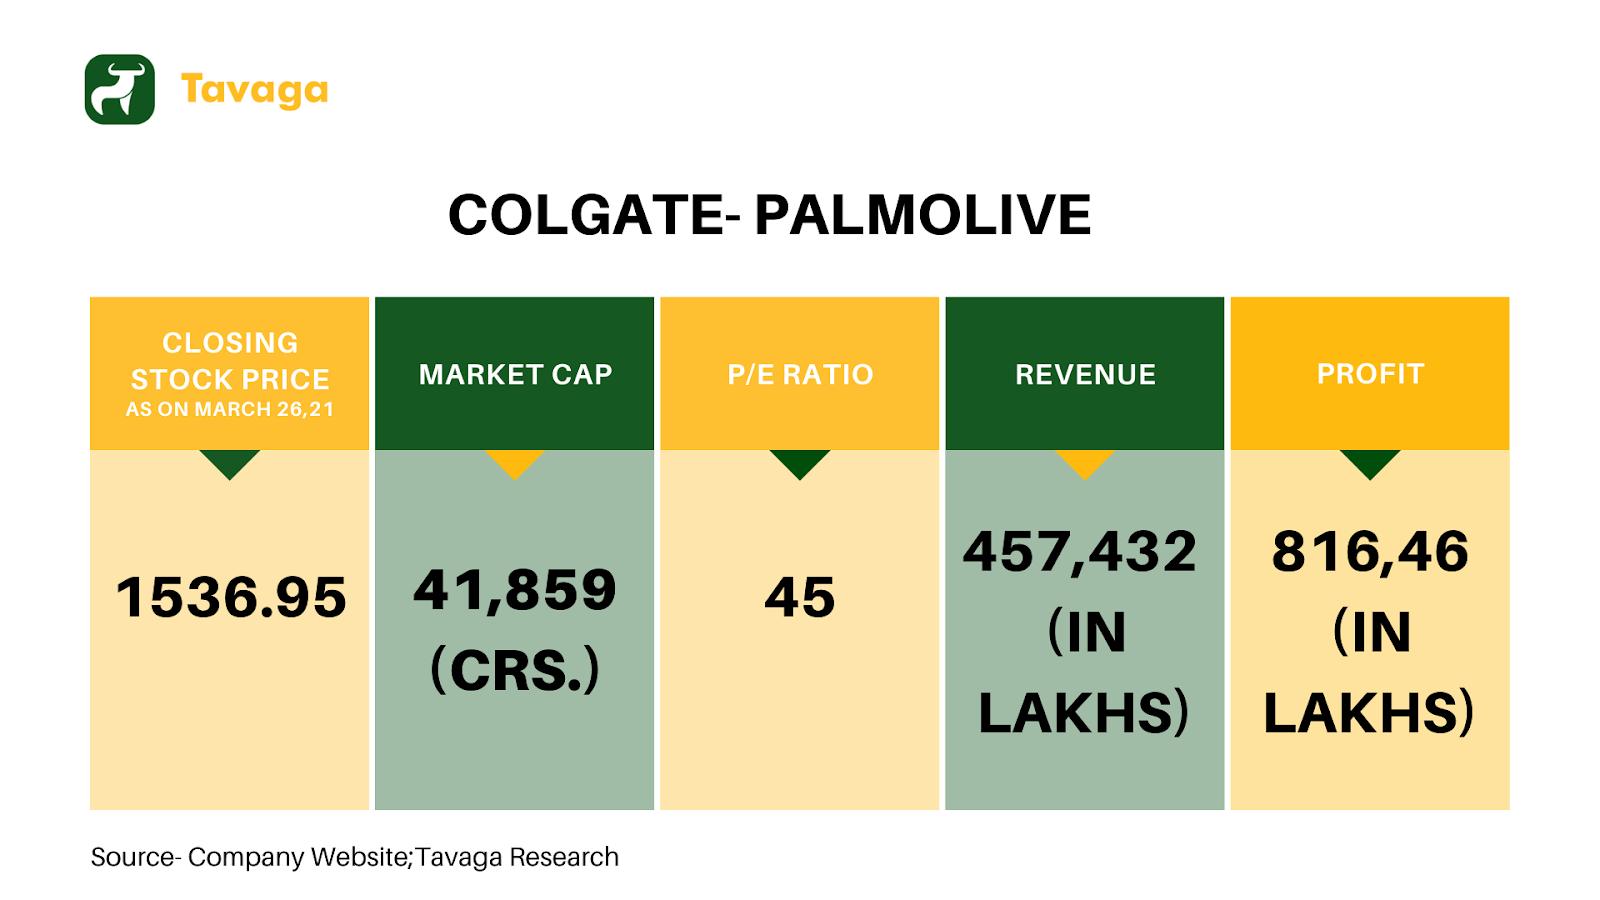 Colgate-Palmolive Financials